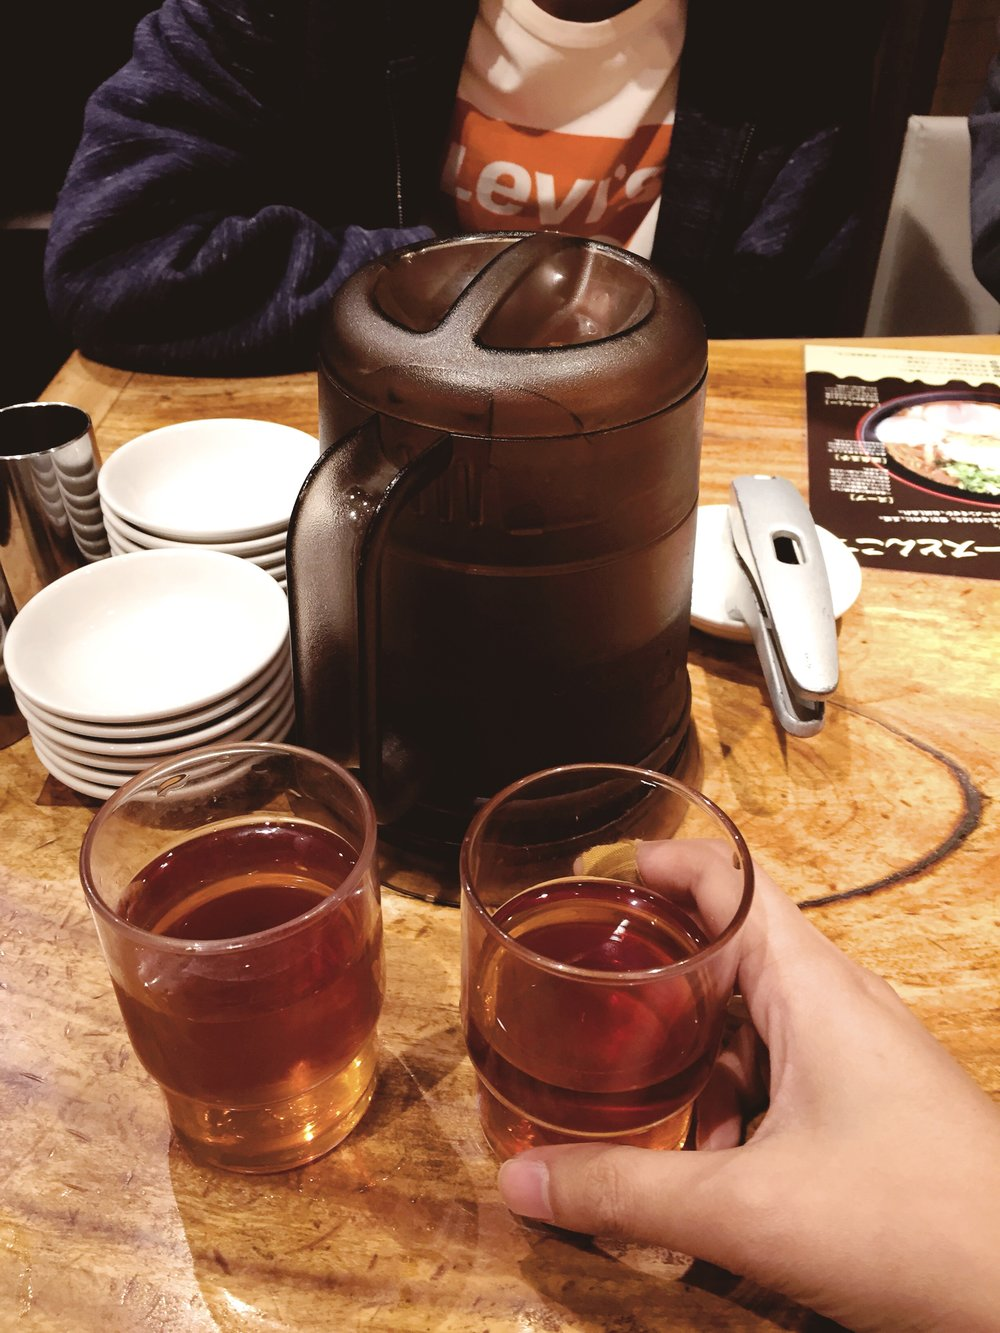 Entah kenapa orang Jepang suka banget sama es teh